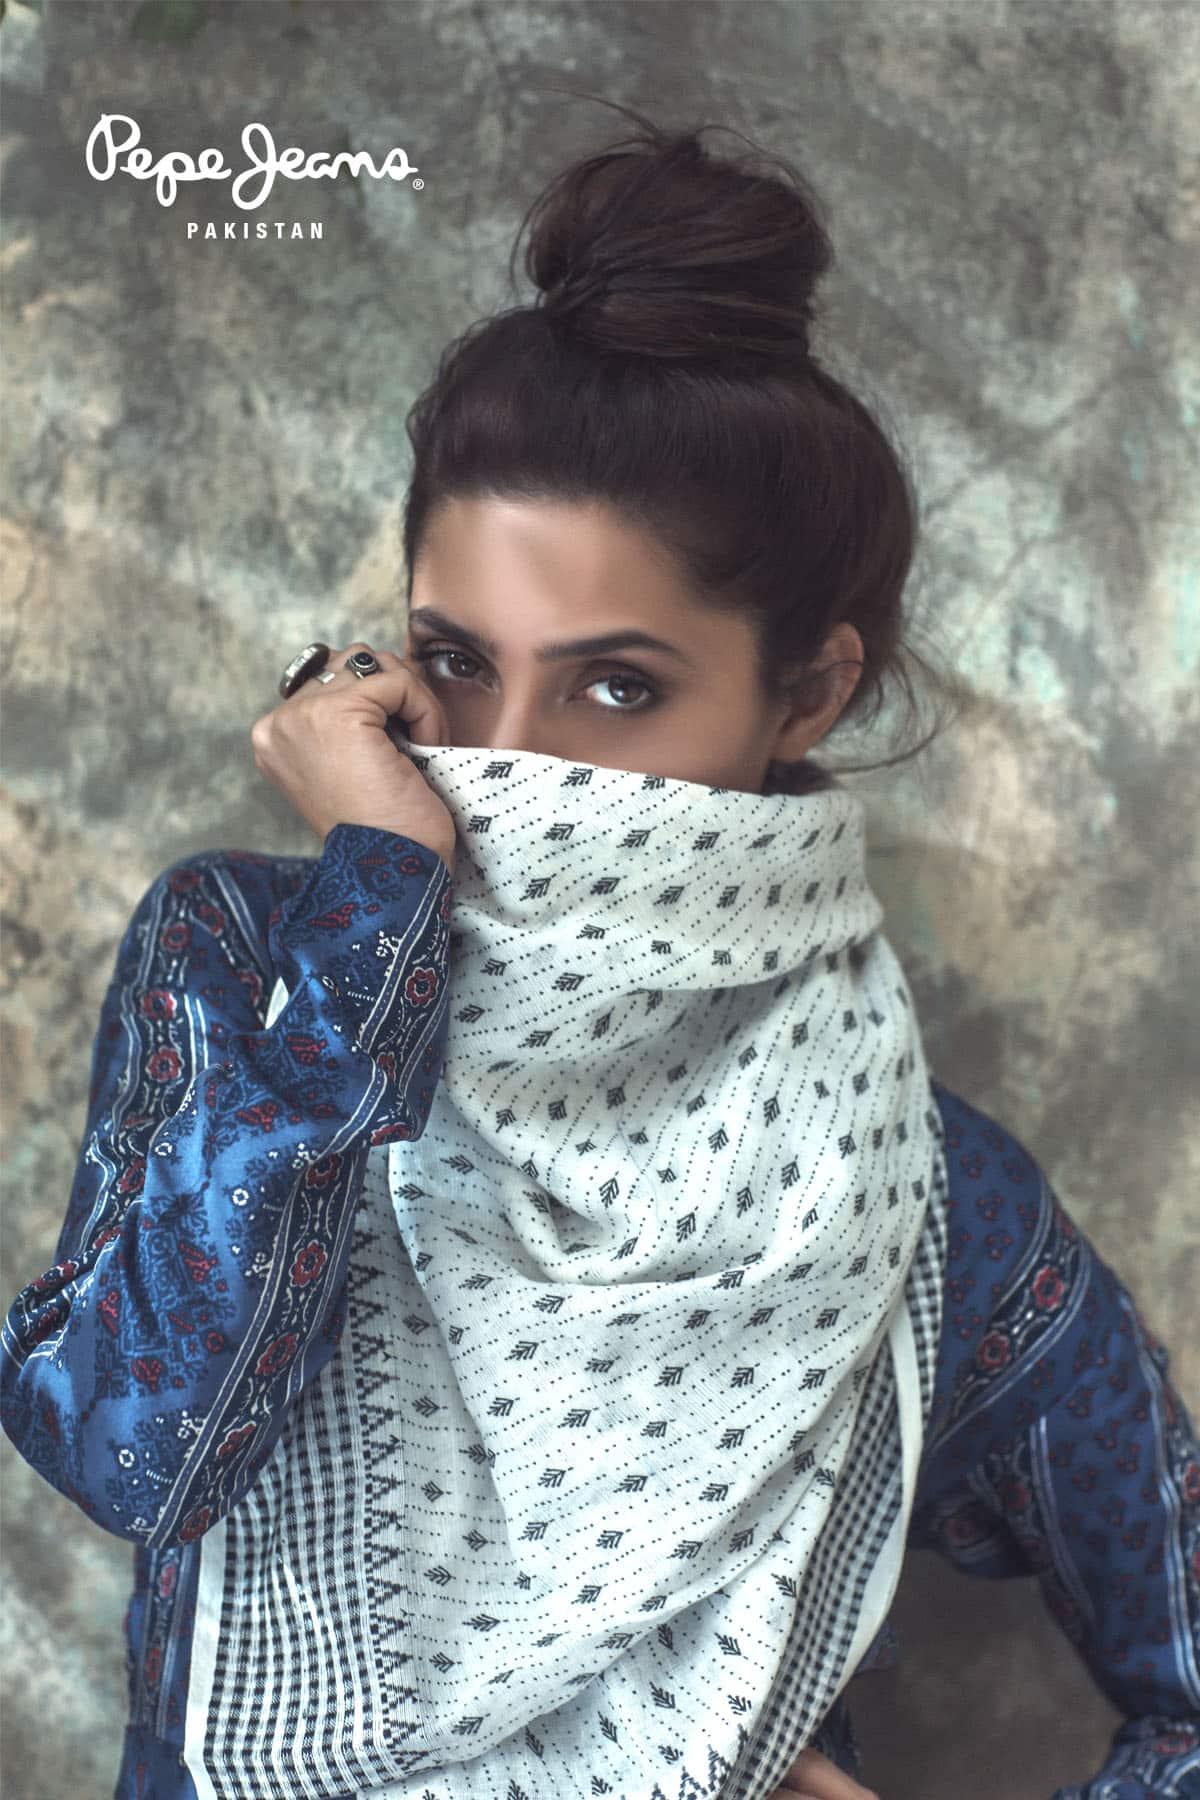 Mahira Khan for Pepe Jeans Pakistan Winter 2015 Campaign – #MKLovesPepe (14)